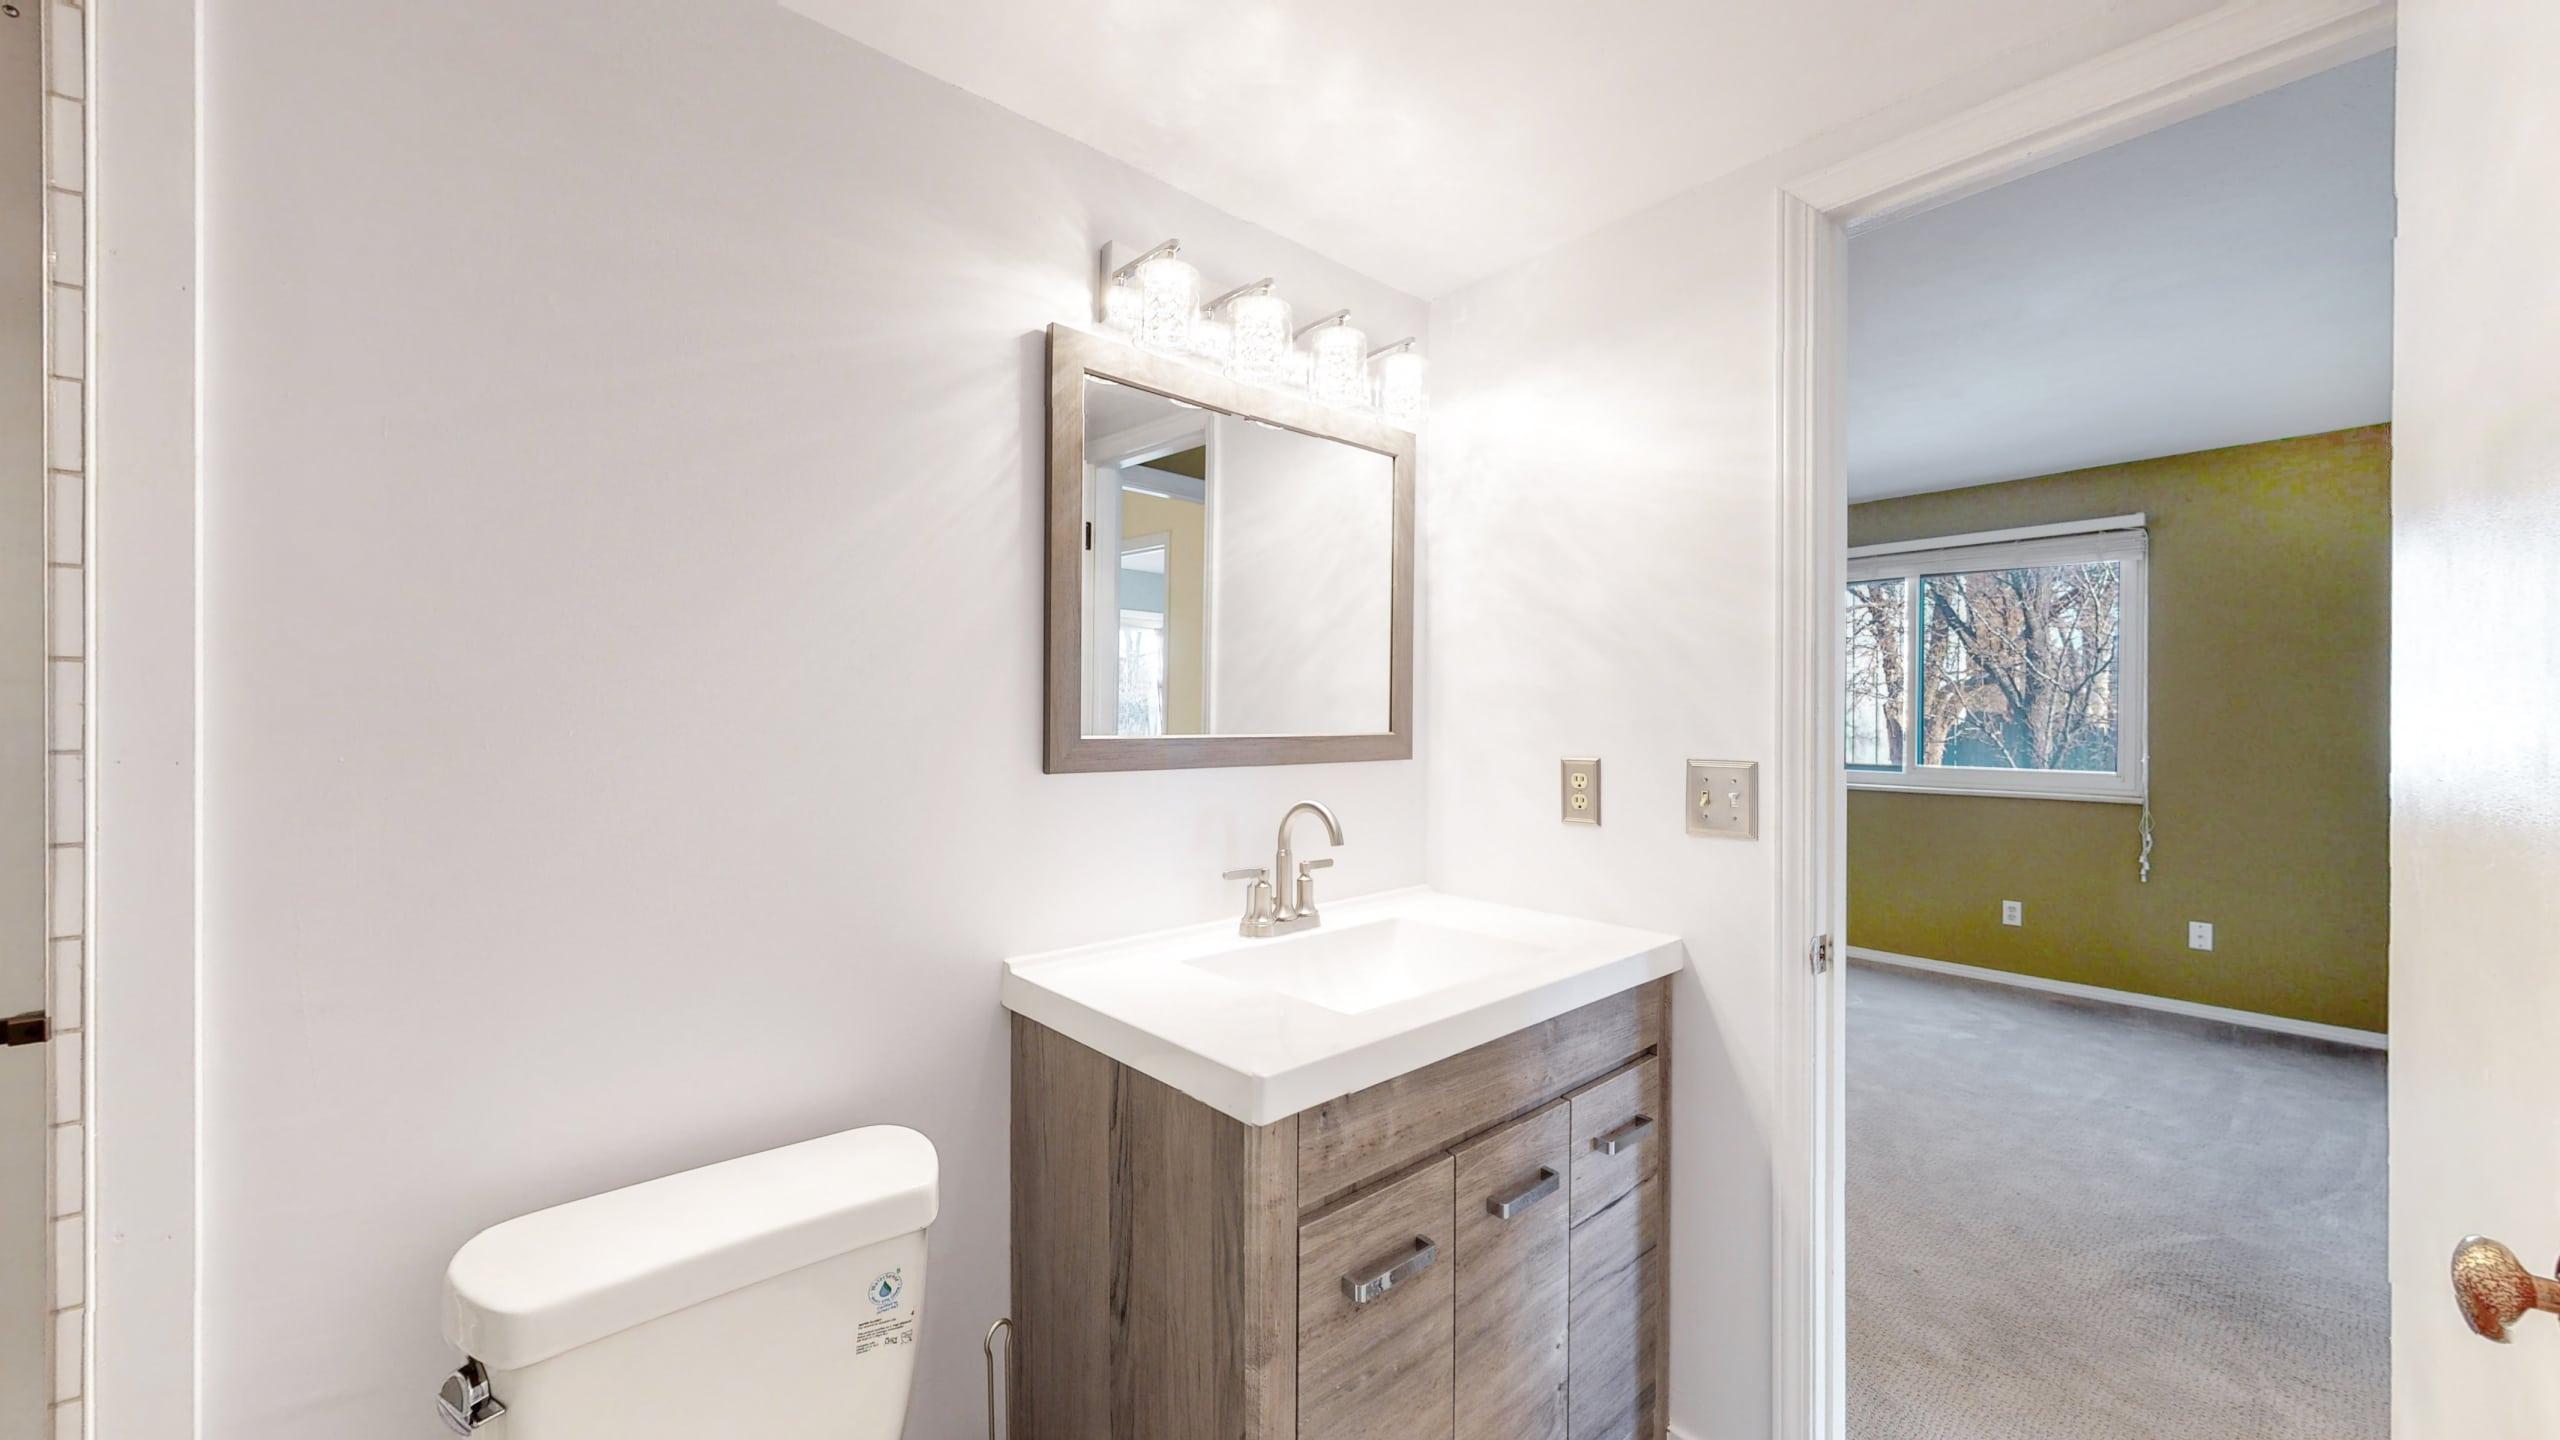 Updated modern bathroom, grey vanity with white sink